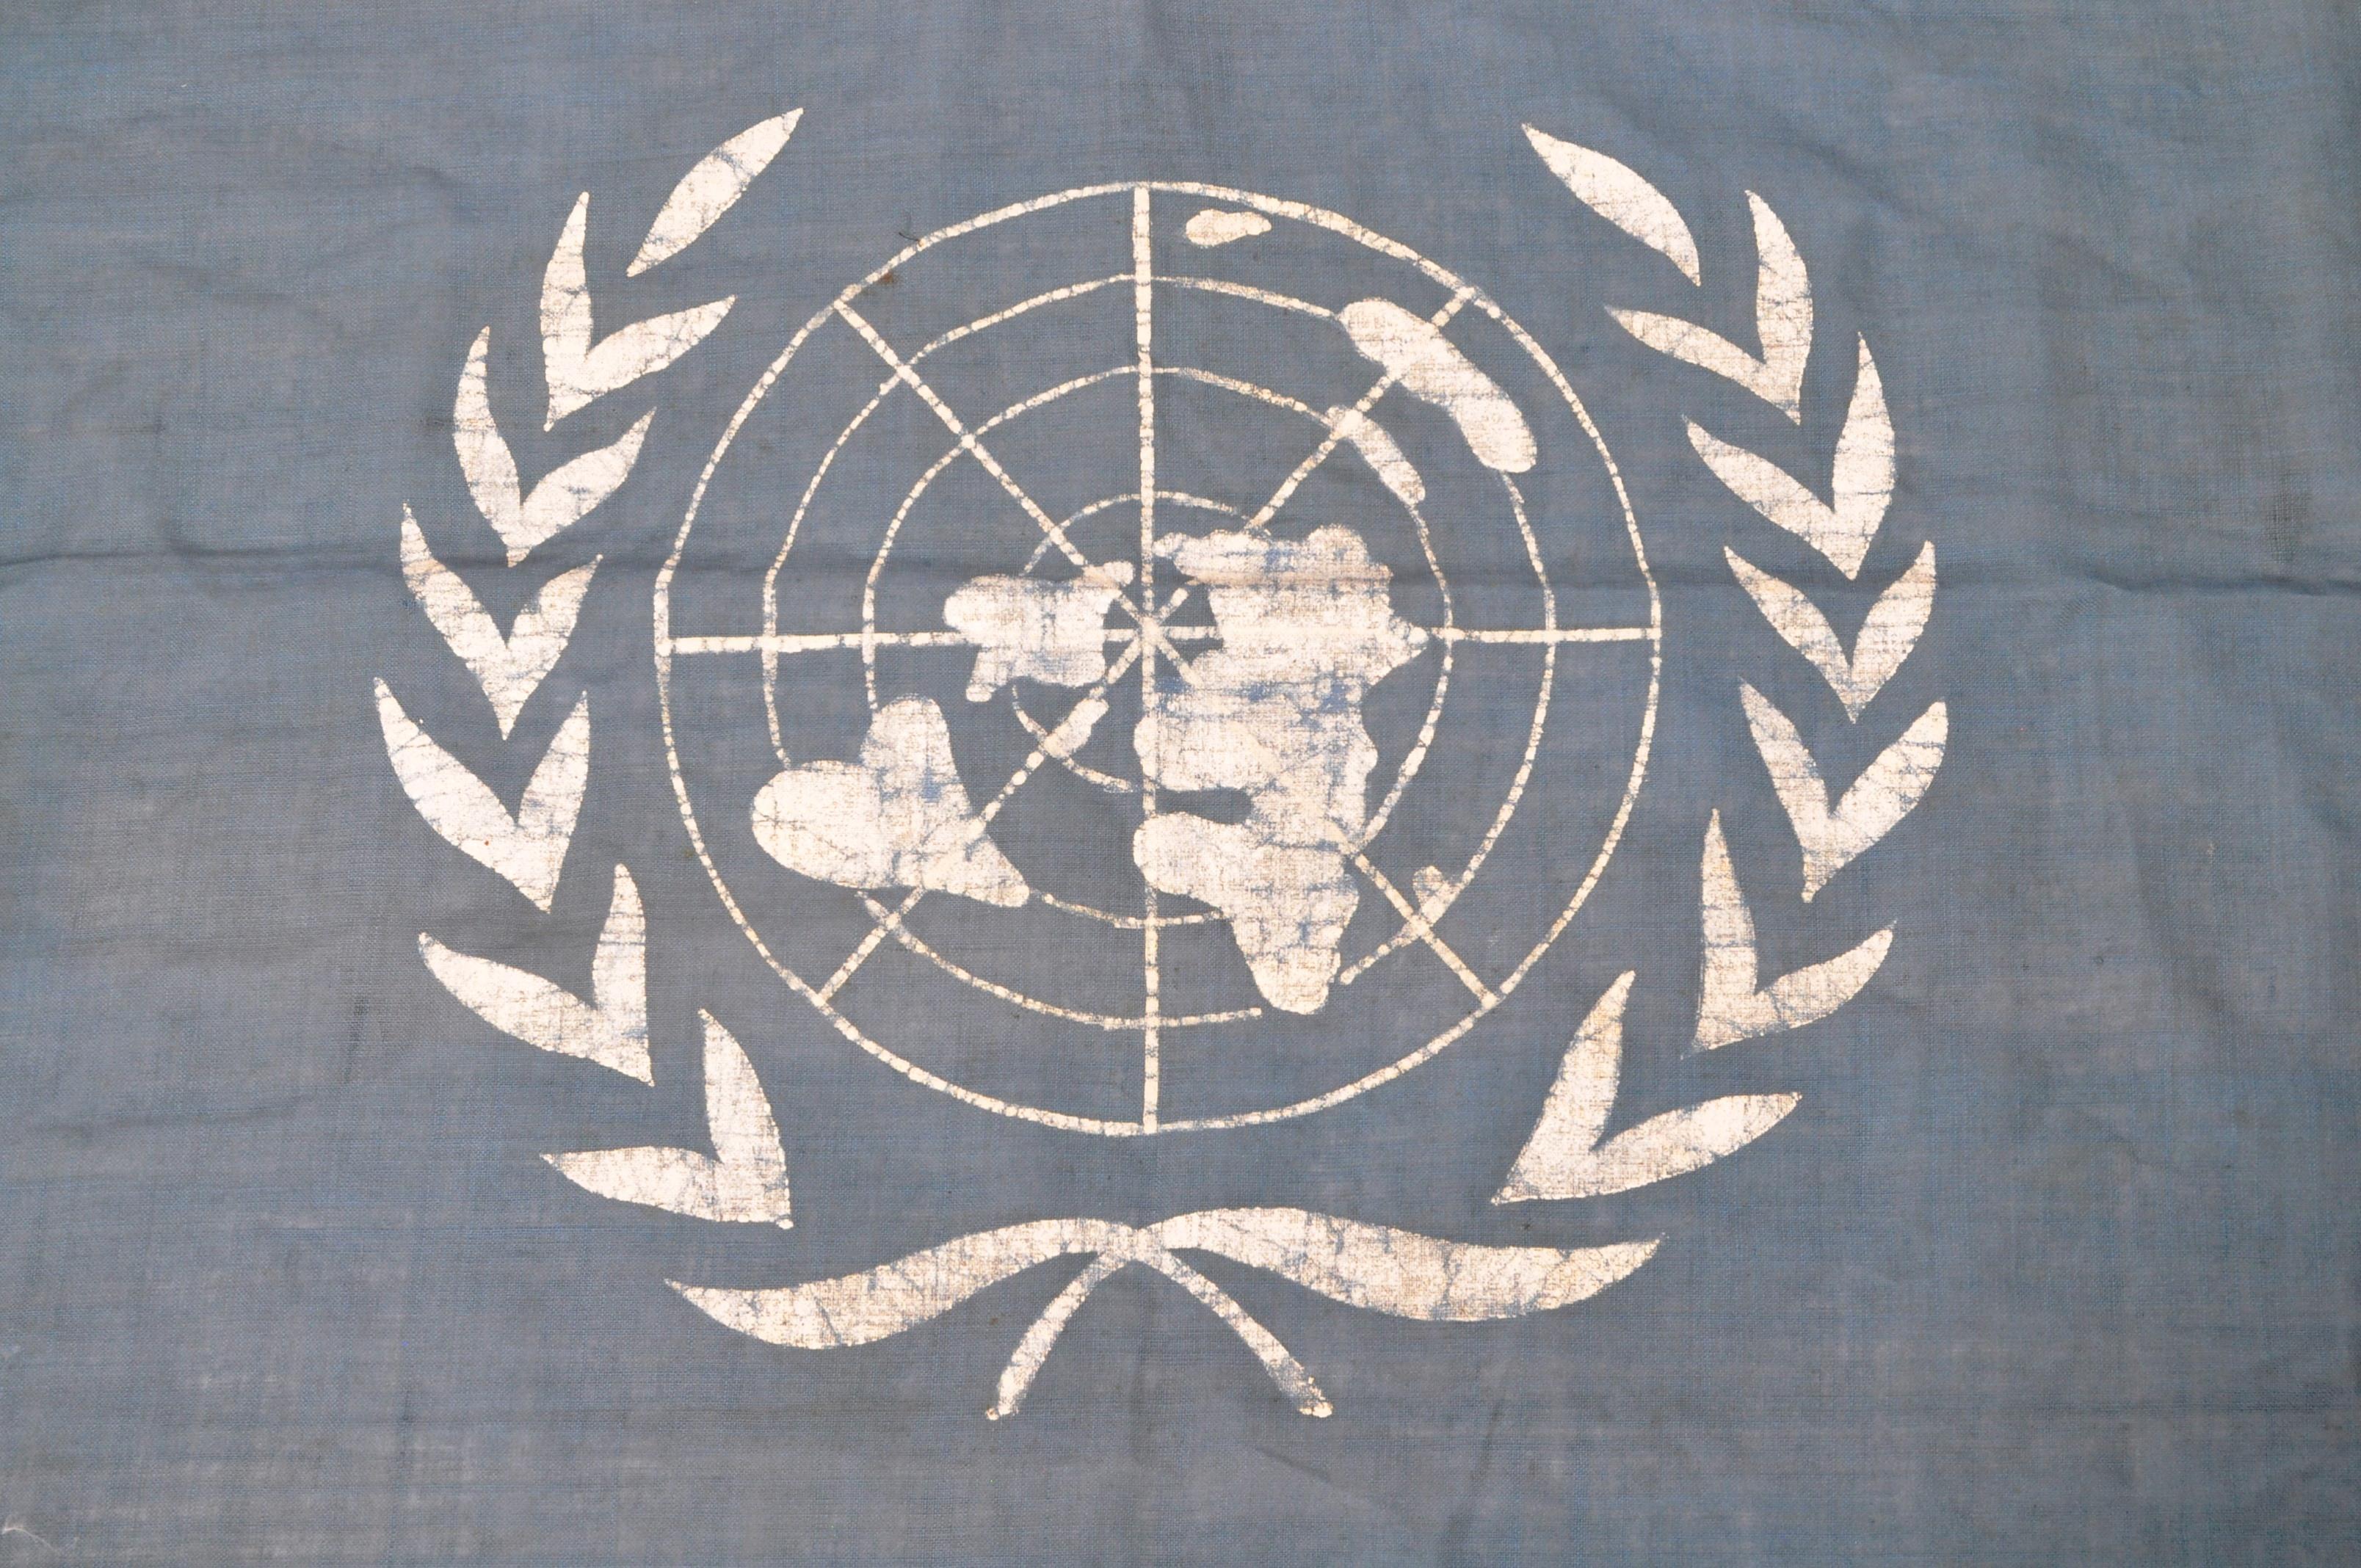 VINTAGE C1950S KOREAN WAR ERA UN UNITED NATIONS FLAG - Image 2 of 6